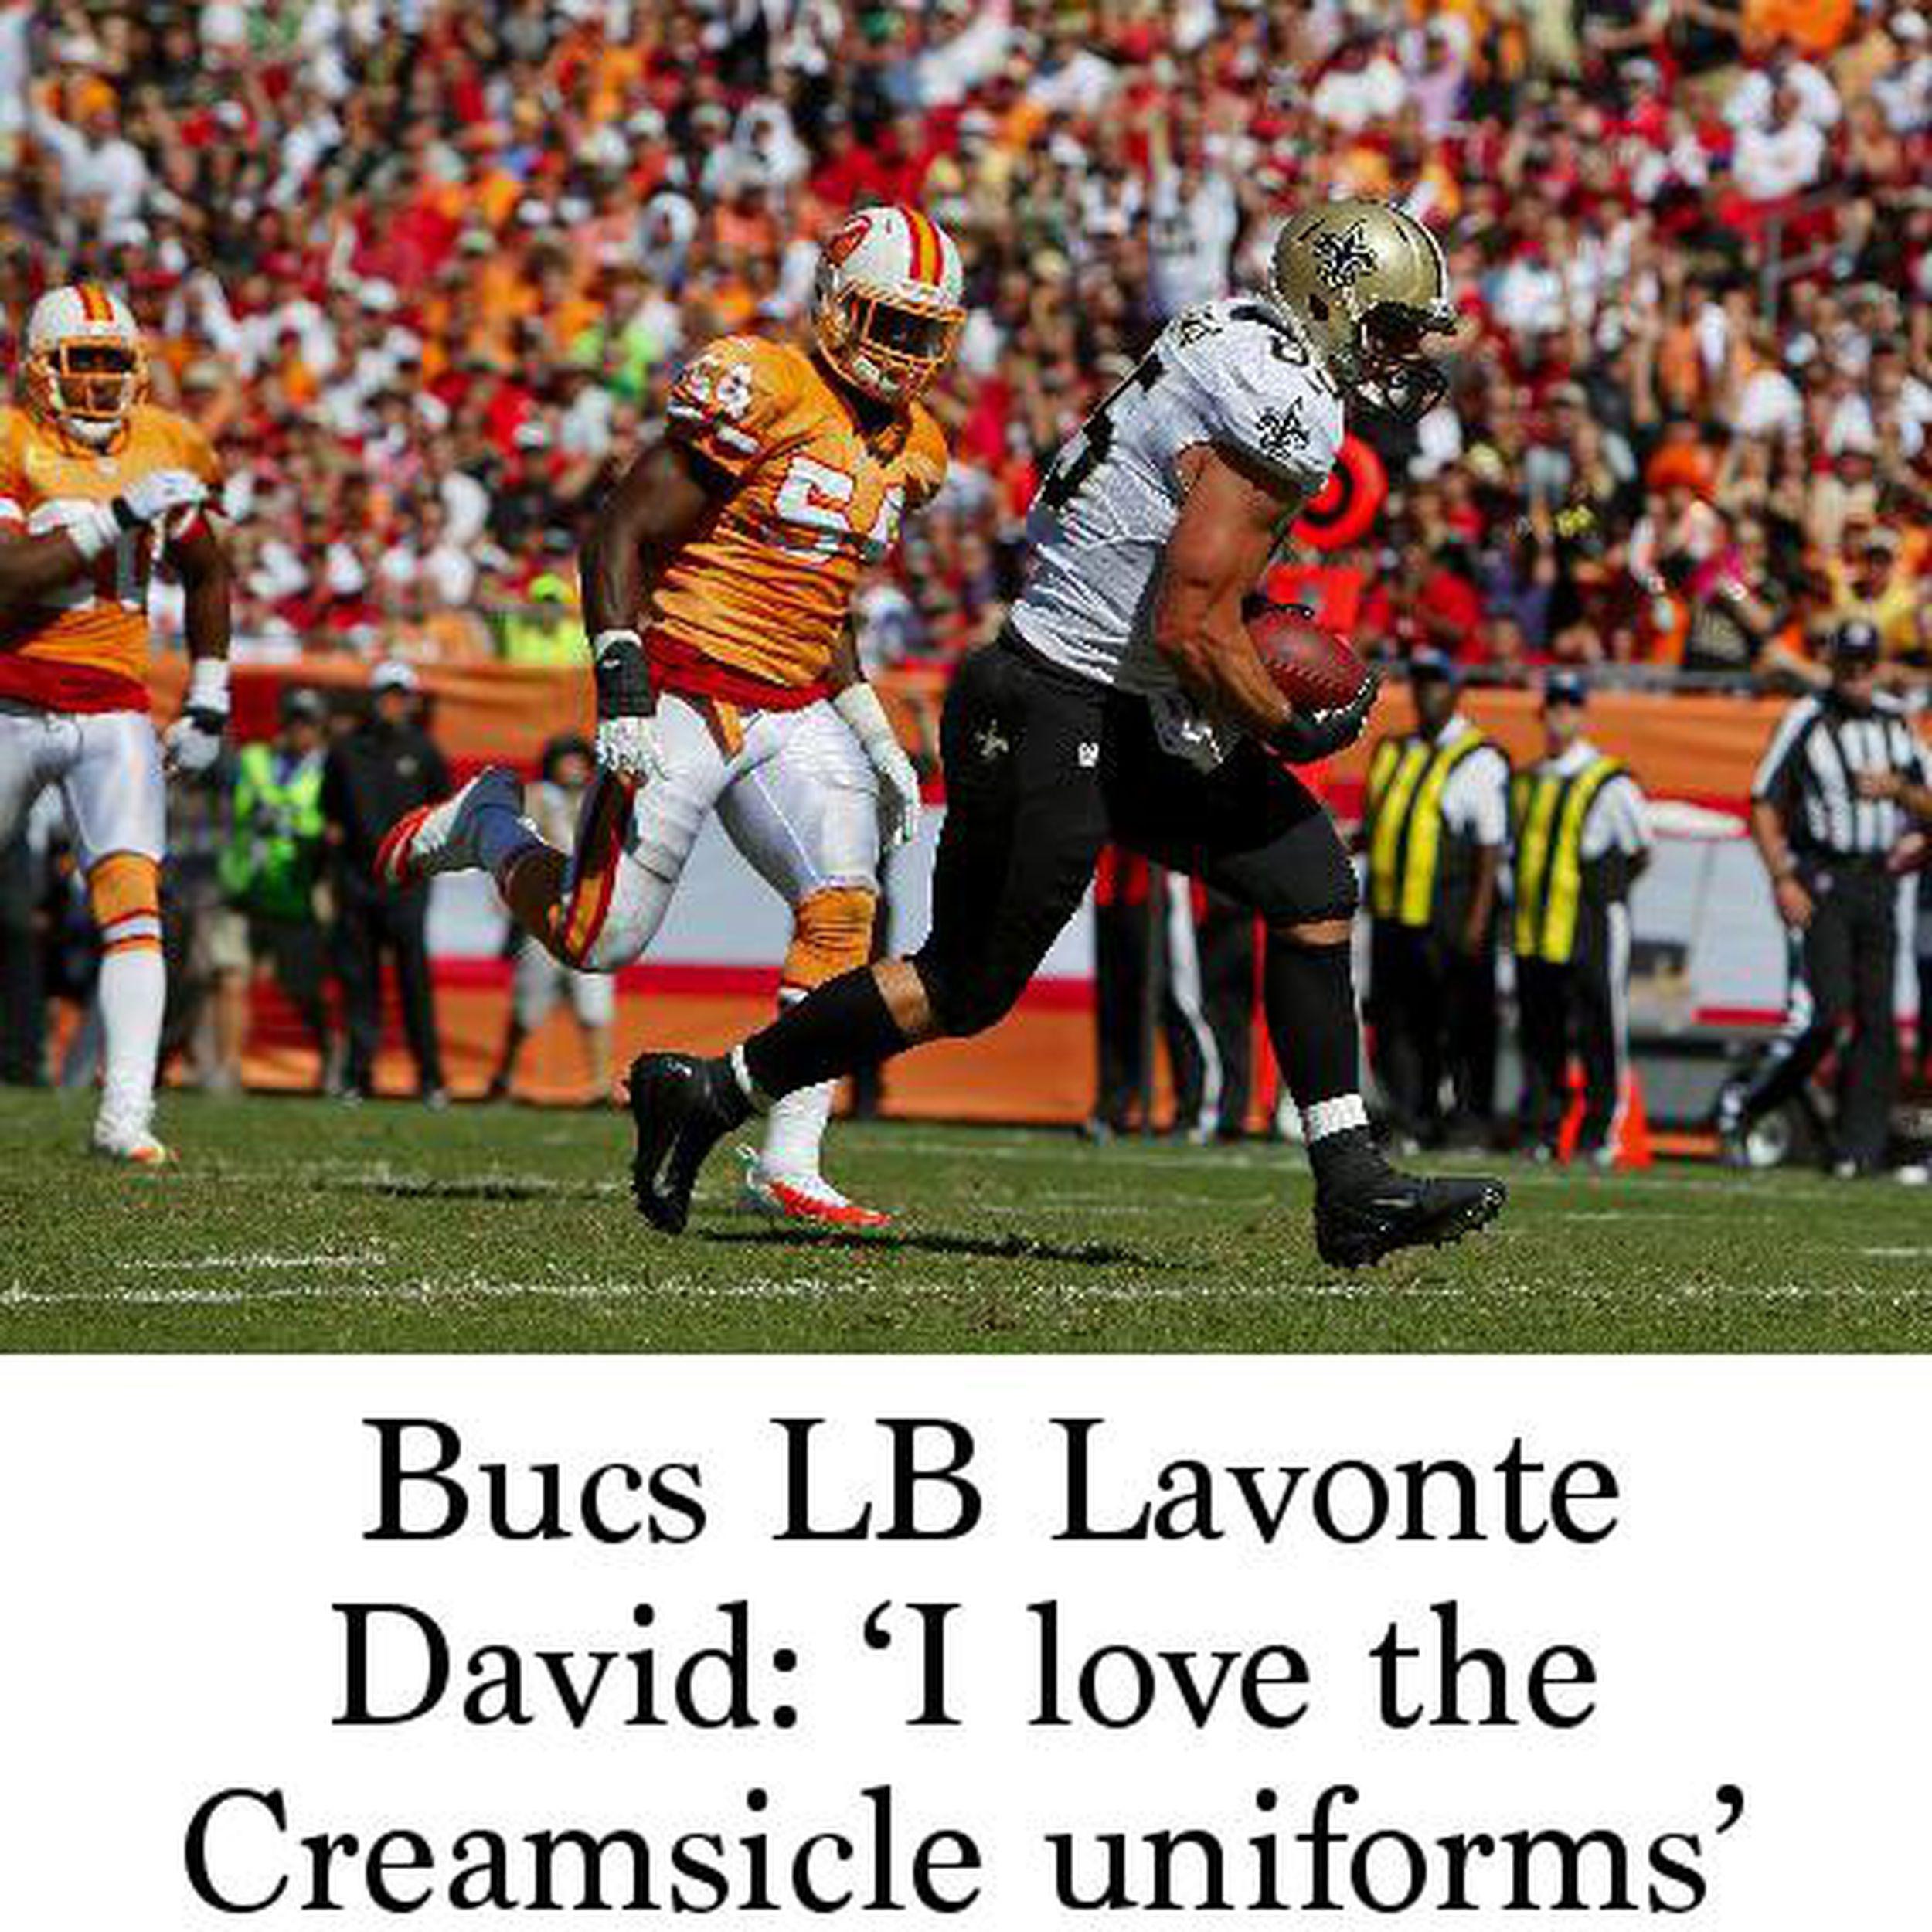 new concept ef7aa 78cae Bucs LB Lavonte David: 'I love the Creamsicle uniforms'